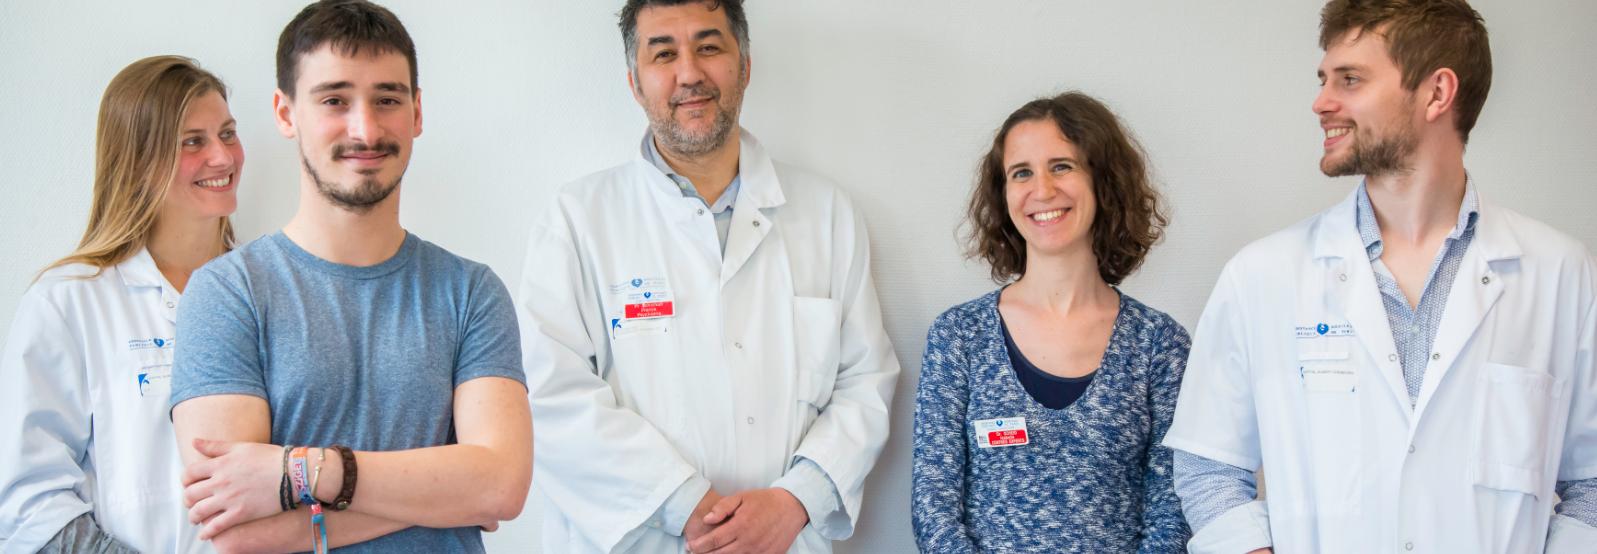 Equipe de médecins, format vertical, crédit Tijana Feterman